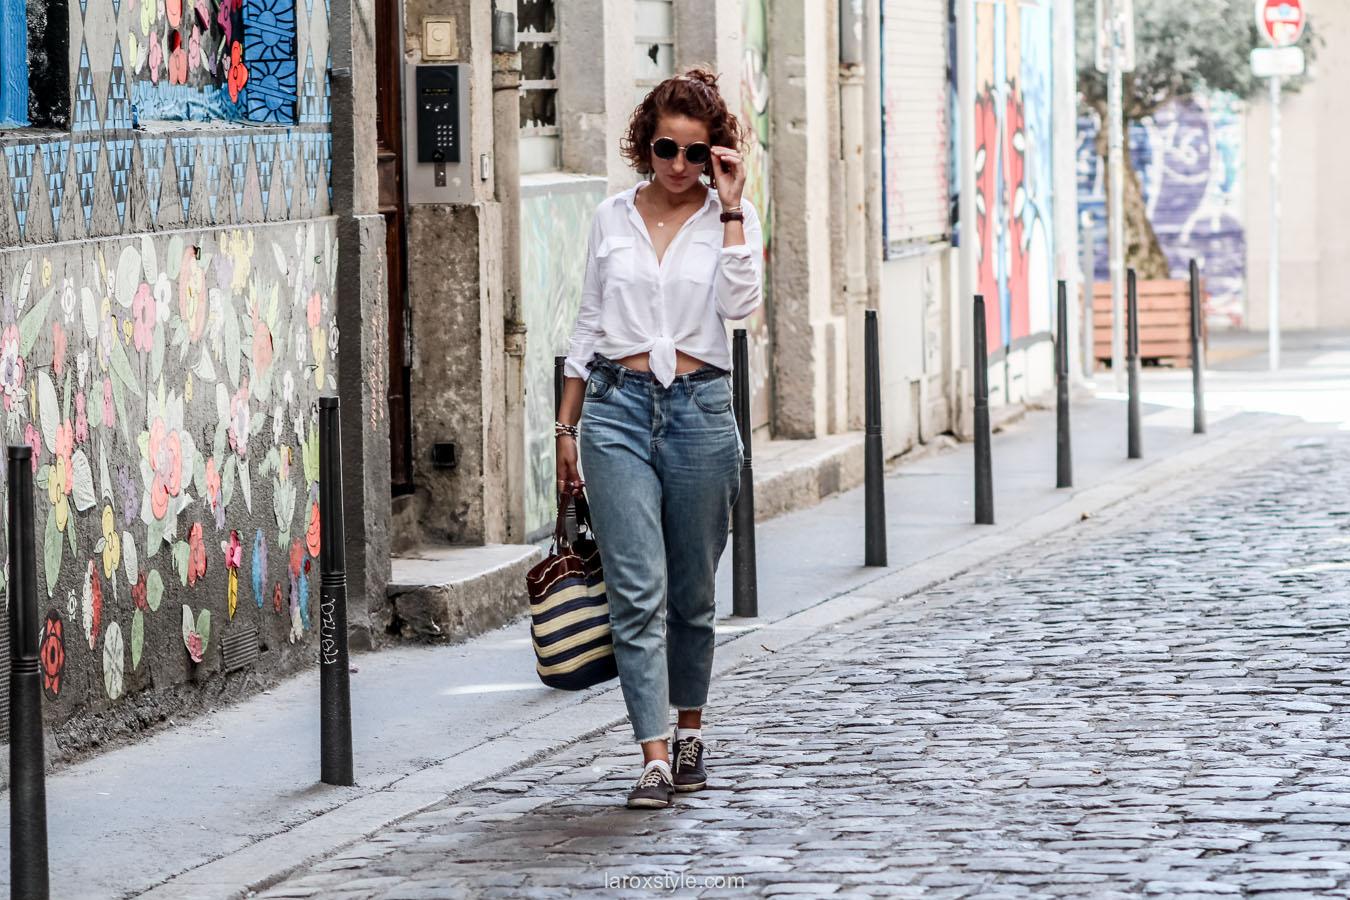 porter le mom jean - chemise blanche nouee - laroxstyle - blog mode lyon